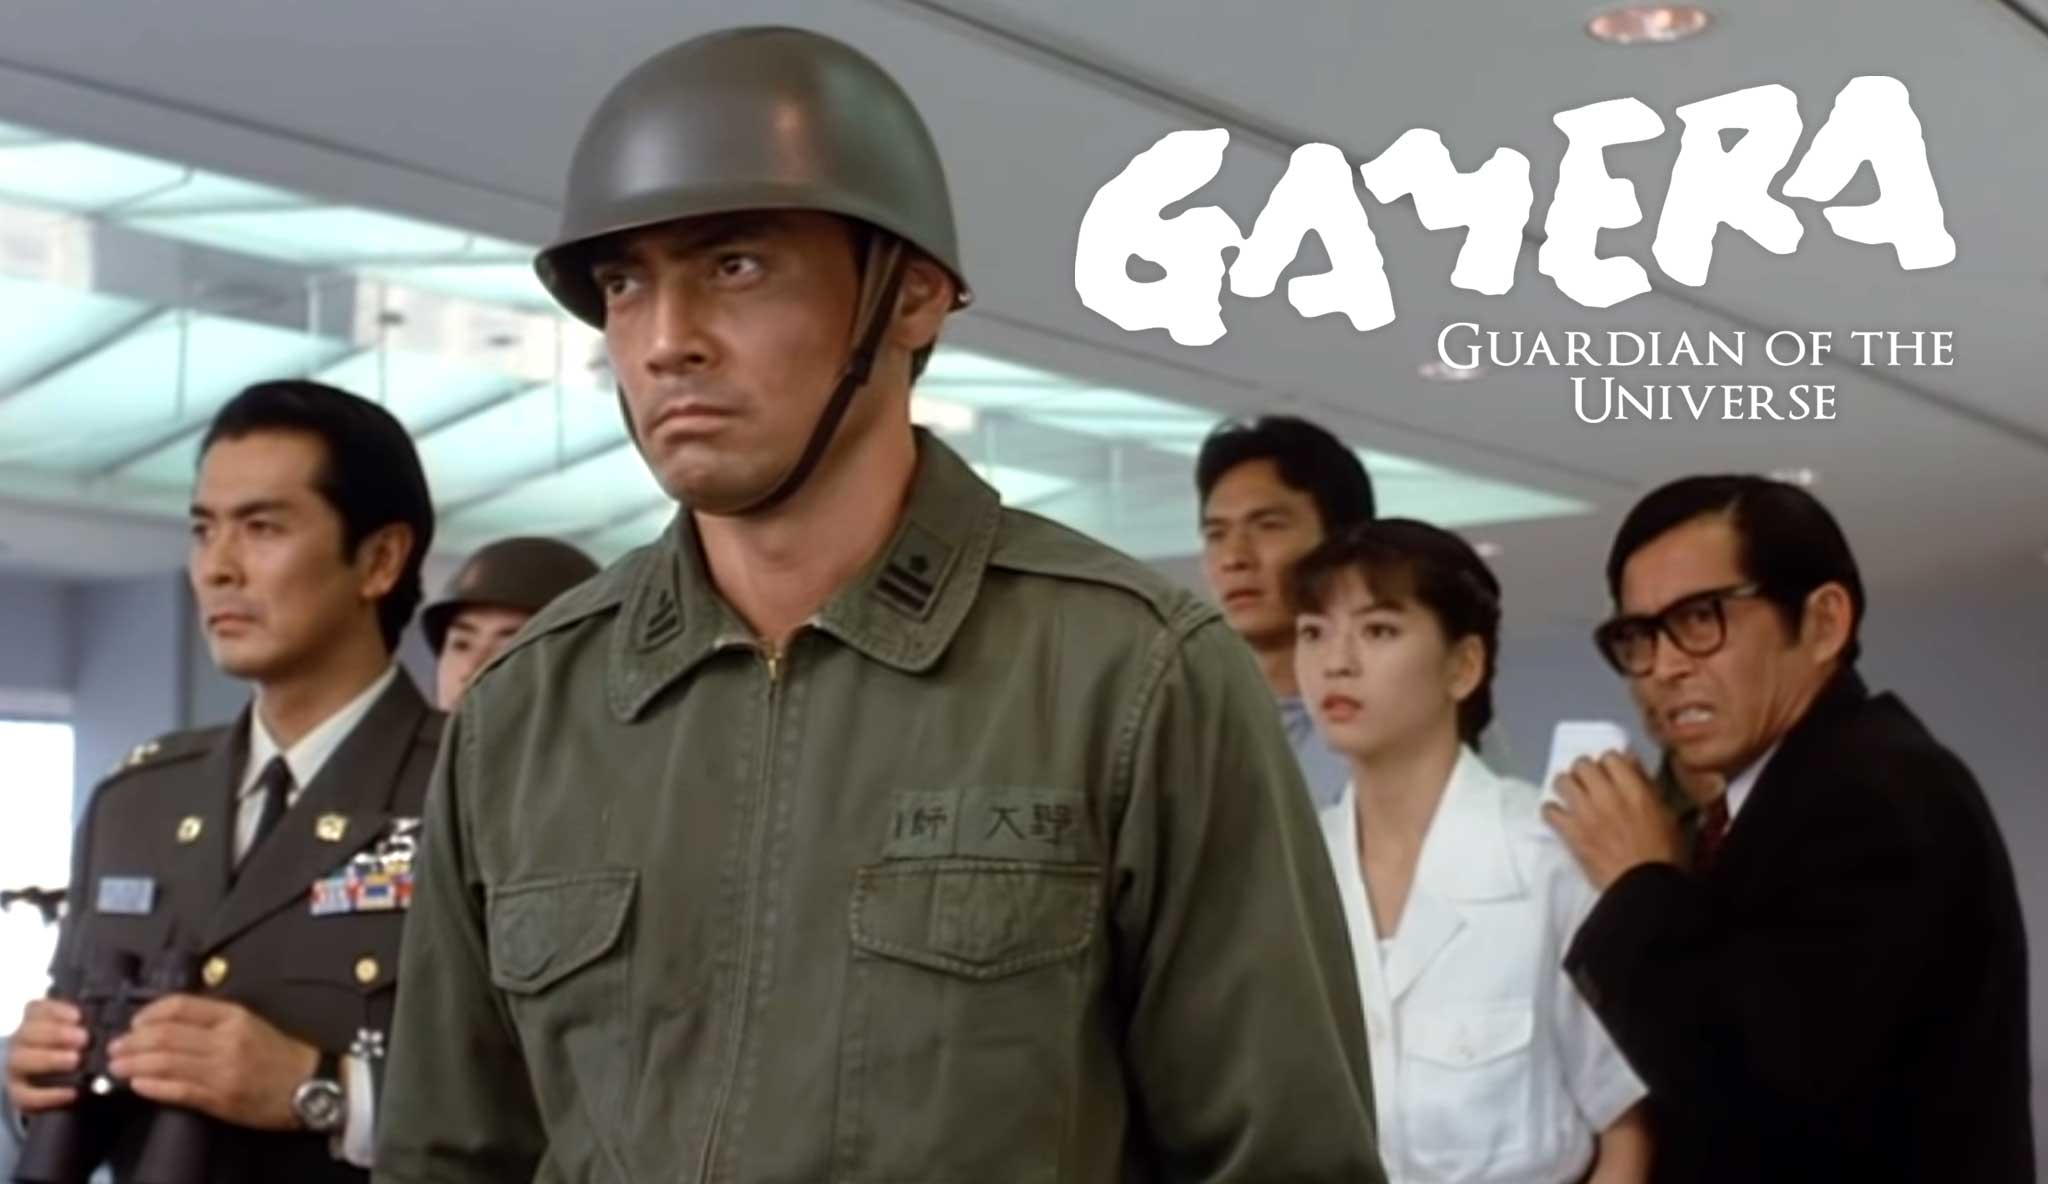 gamera-1-guardian-of-the-universe-2\header.jpg